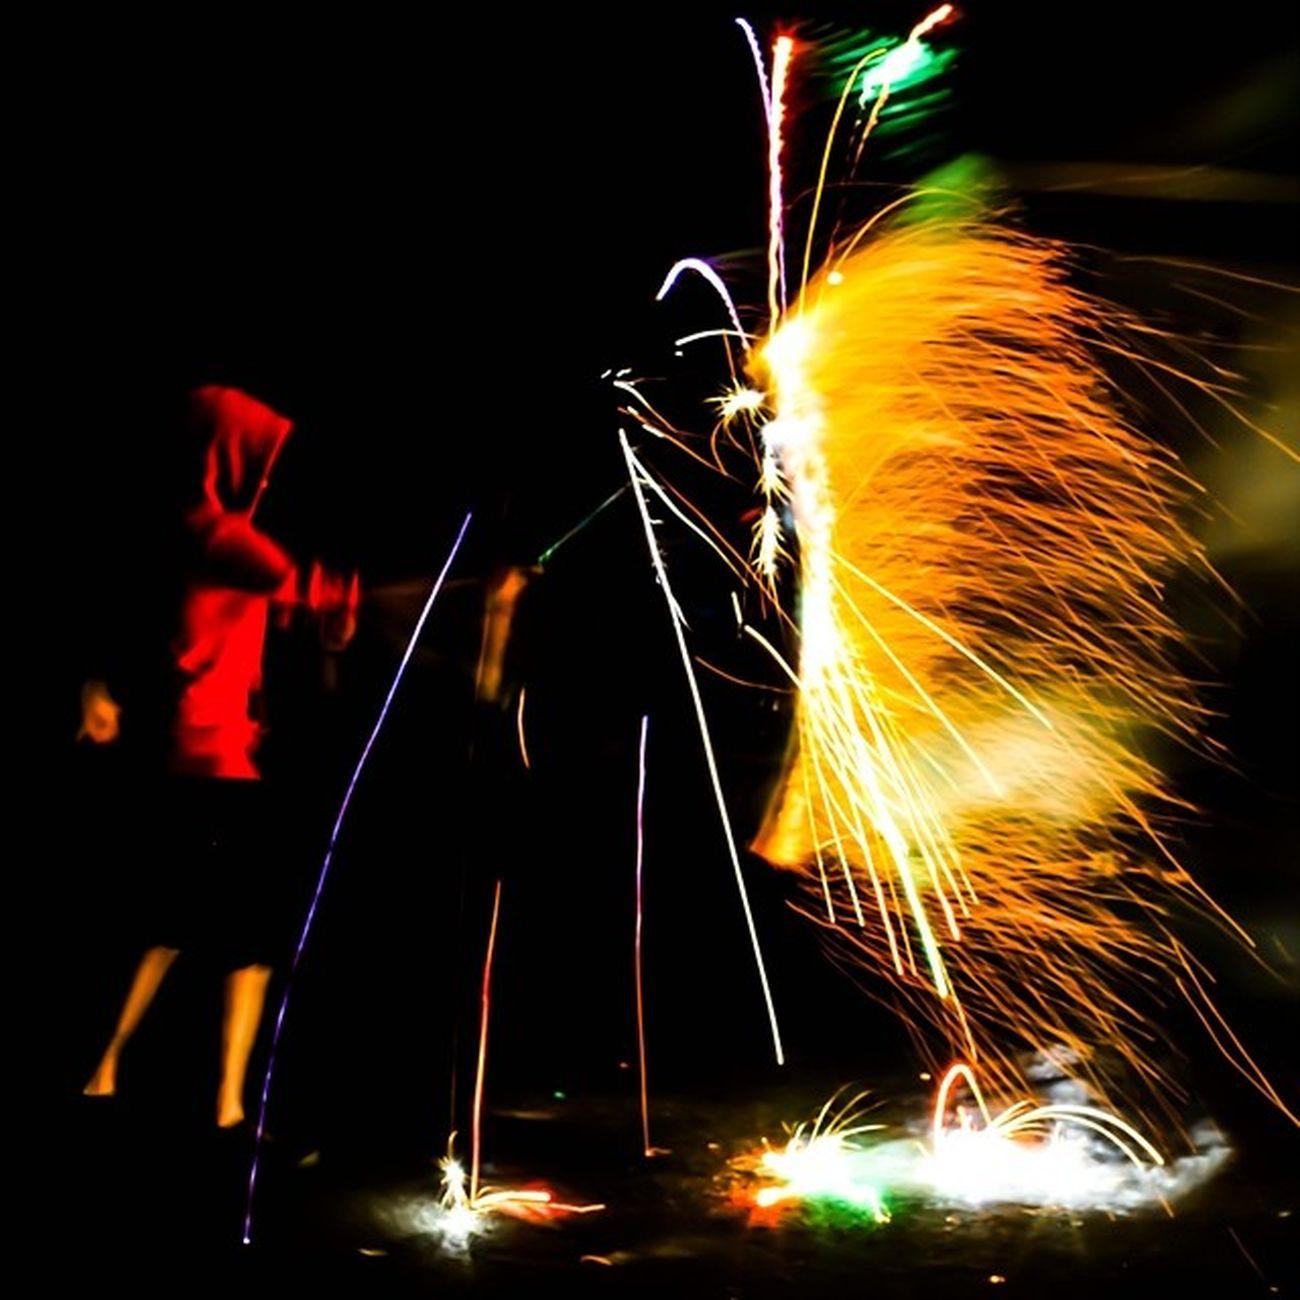 FBF  Nofilter 5dmk2 shot this like 3 yeas ago . Hope you enjoy Montebello merica murica 4thofjuly fireworks slowshutterapp